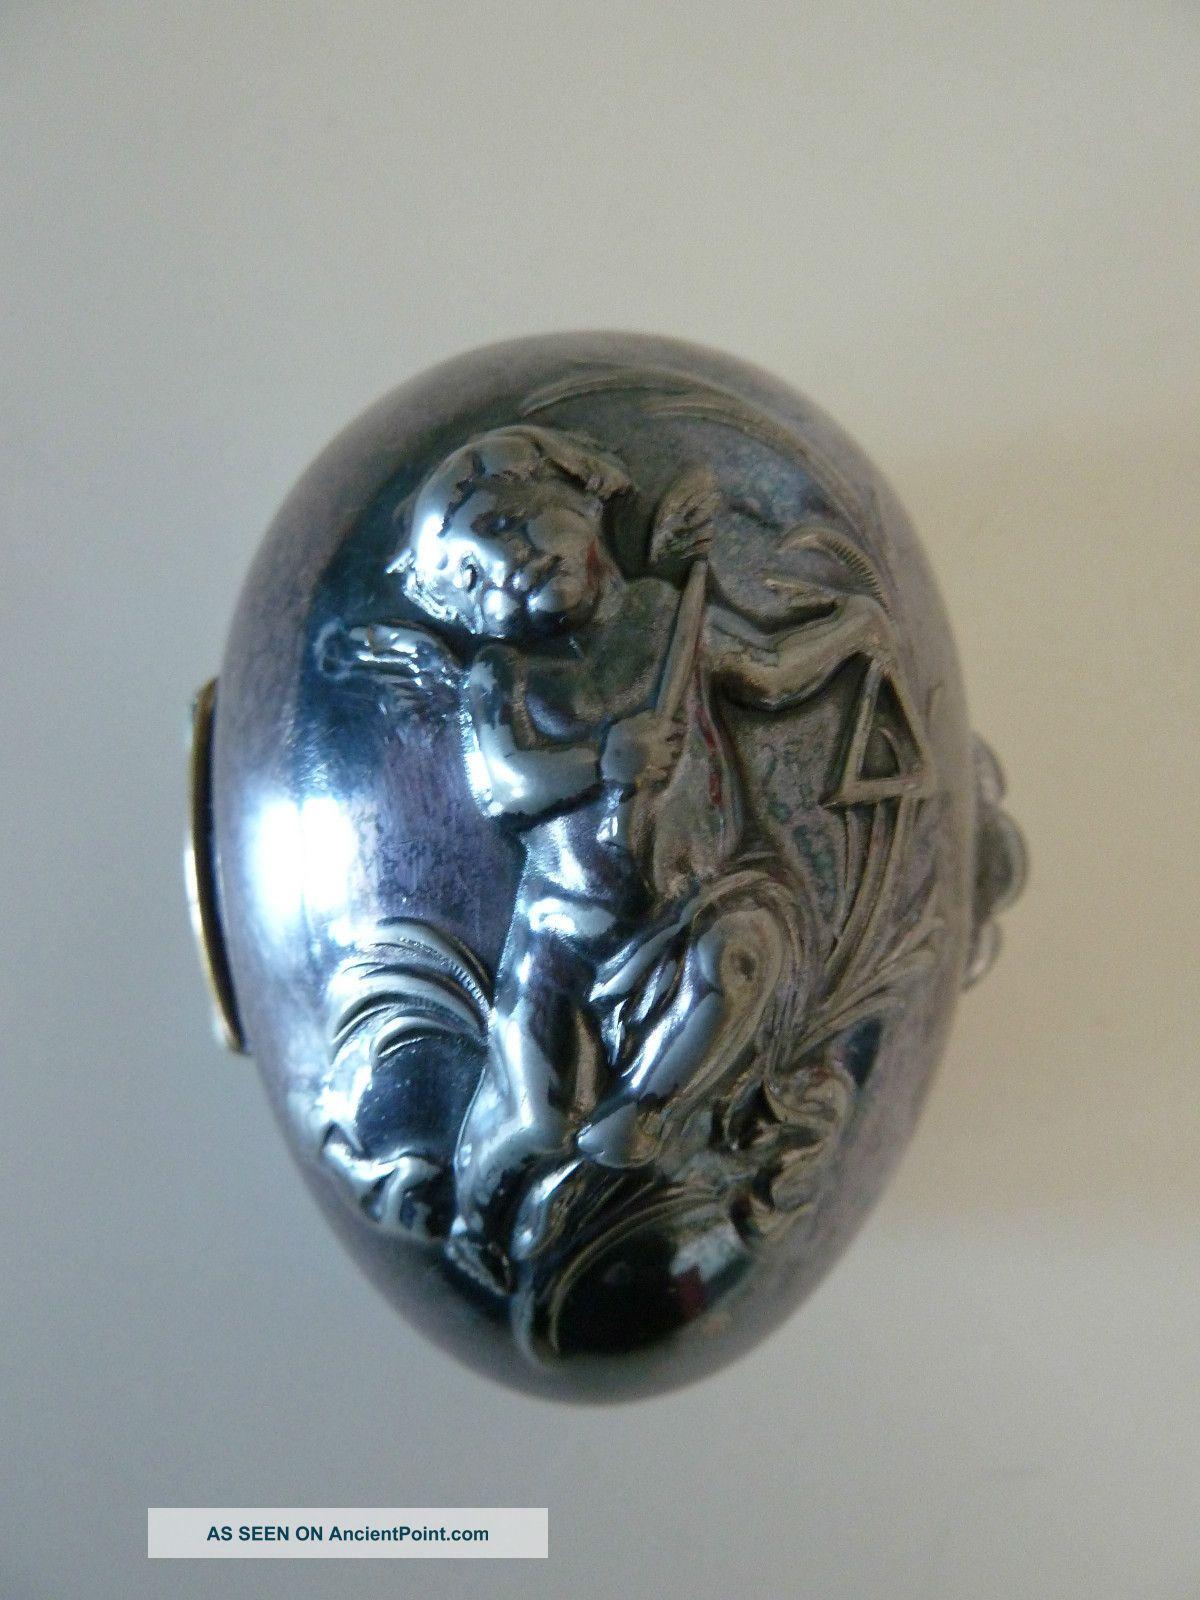 Antique Quadruple Plate Hinged Egg Shaped Trinket Box With Cherub Other photo